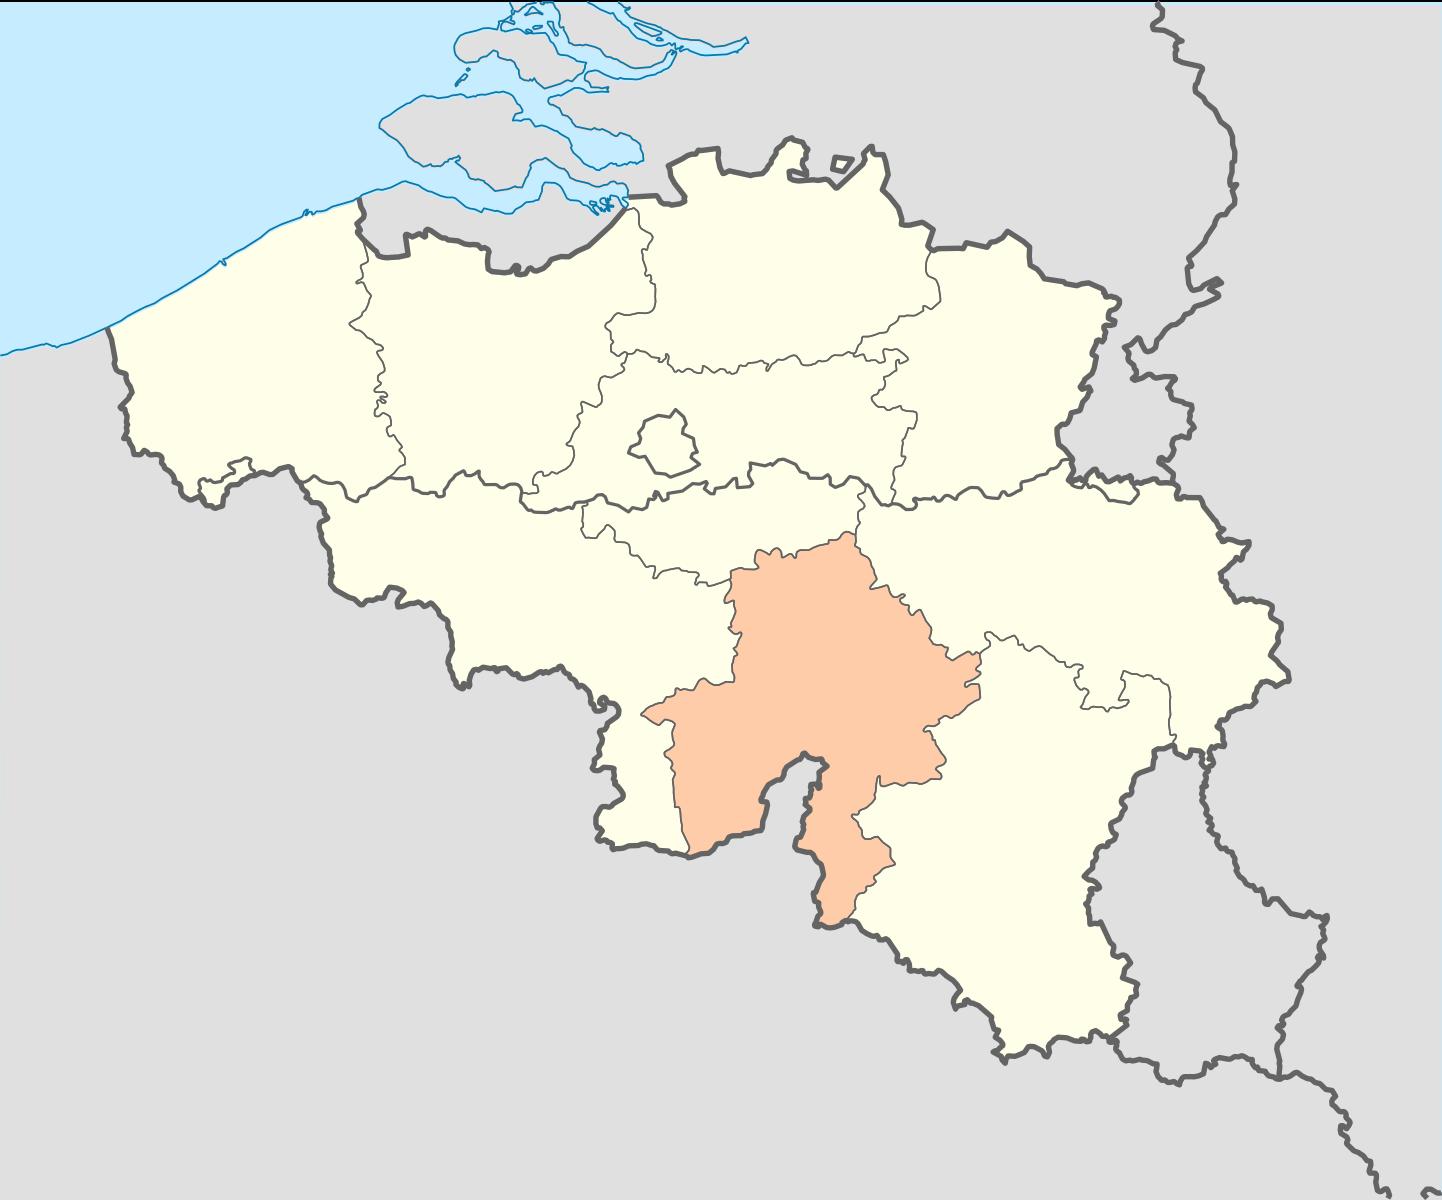 FileProvince of Namur Belgium locationsvg Belgium Pinterest